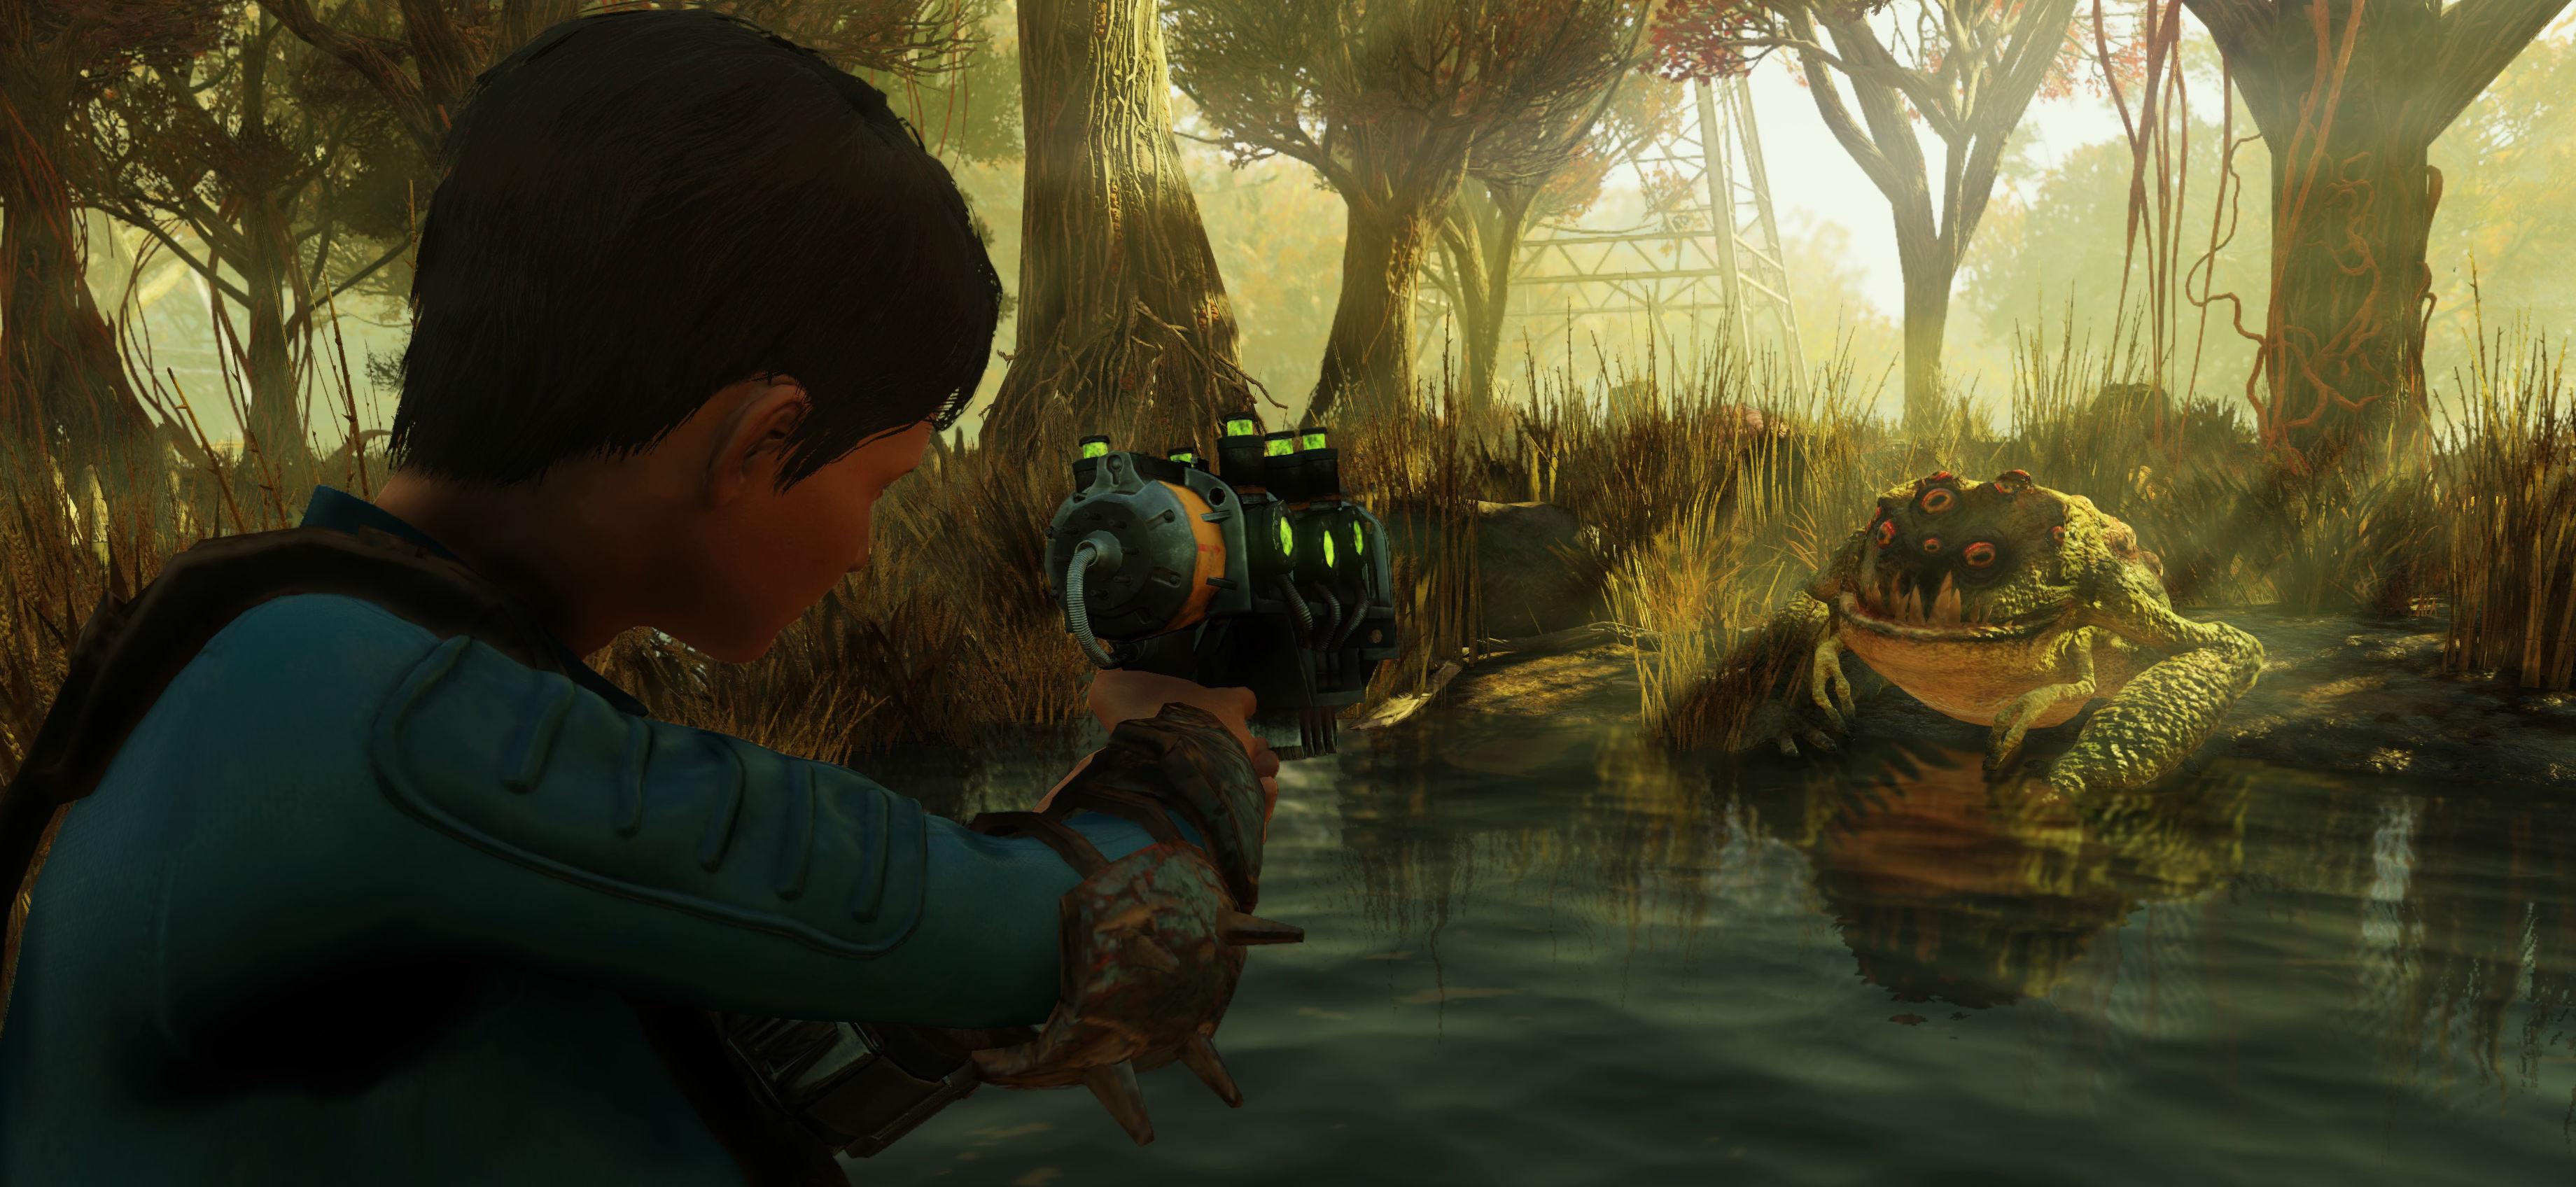 Bethesda confirms more bug fixes coming for the very-buggy Fallout 76 screenshot